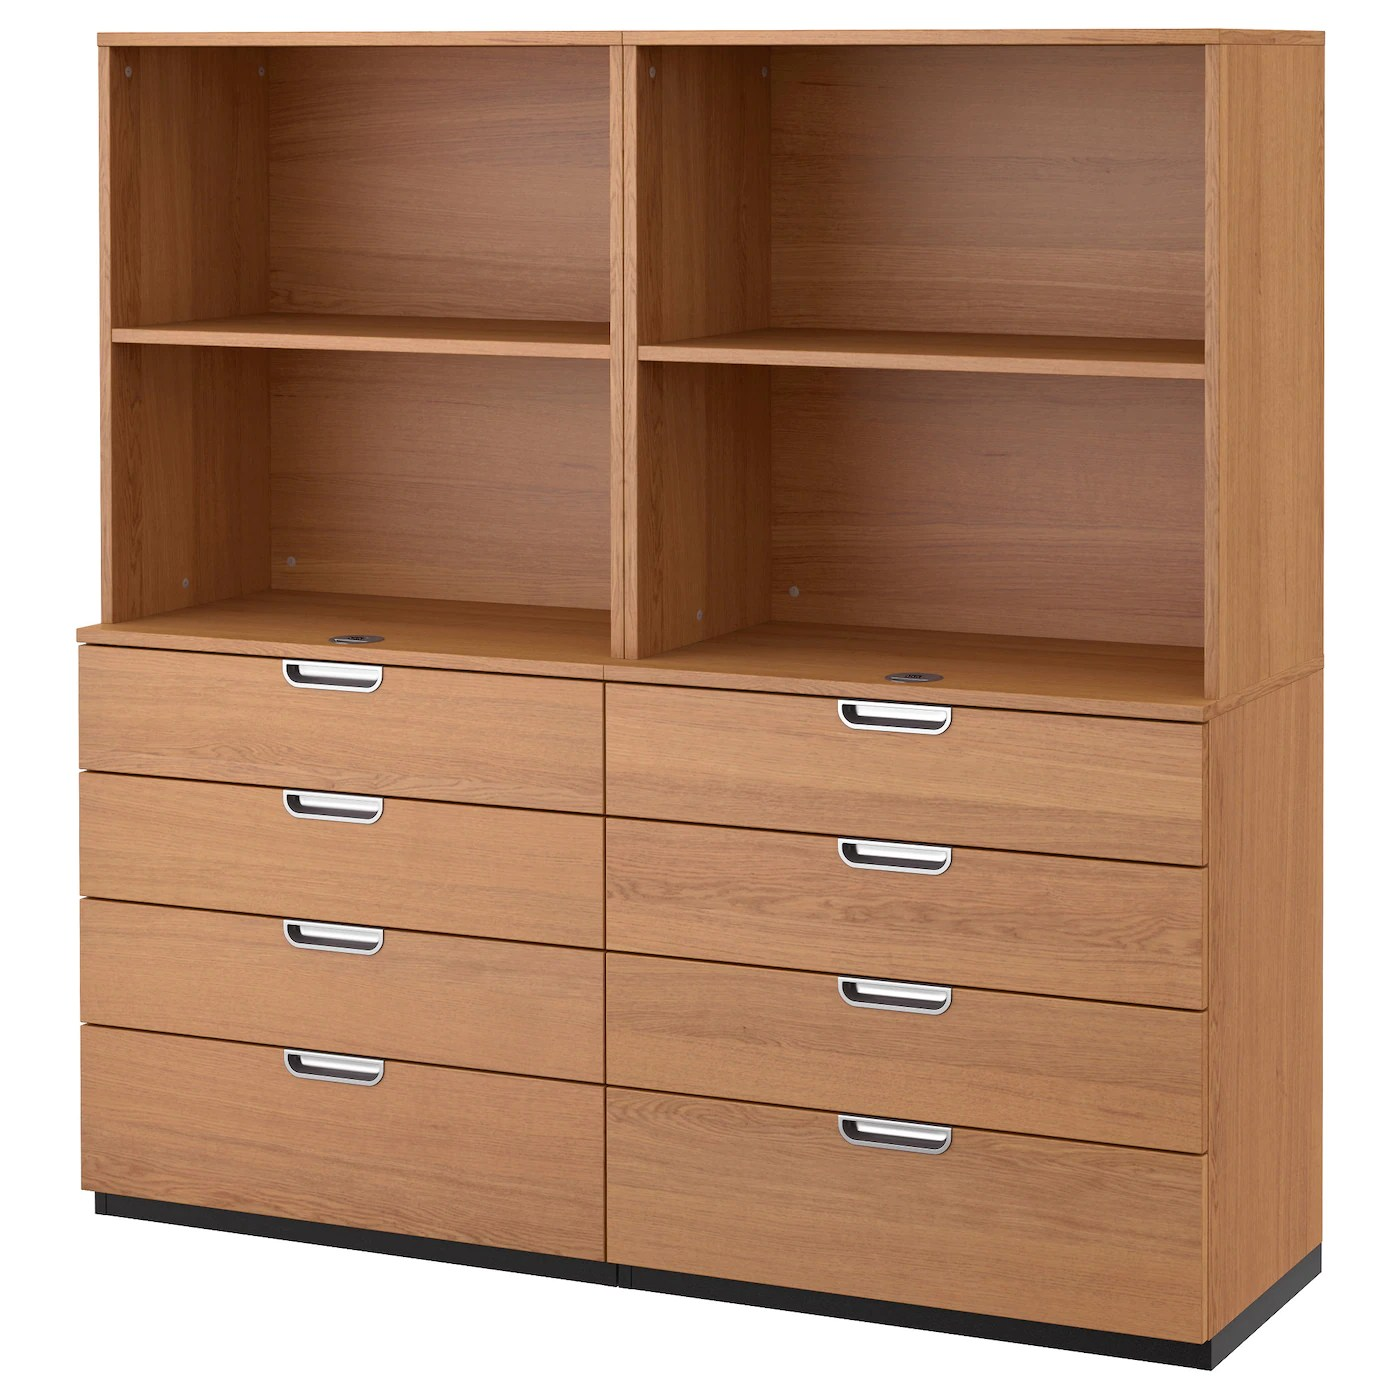 Galant Storage Combination With Drawers Oak Veneer 160x160